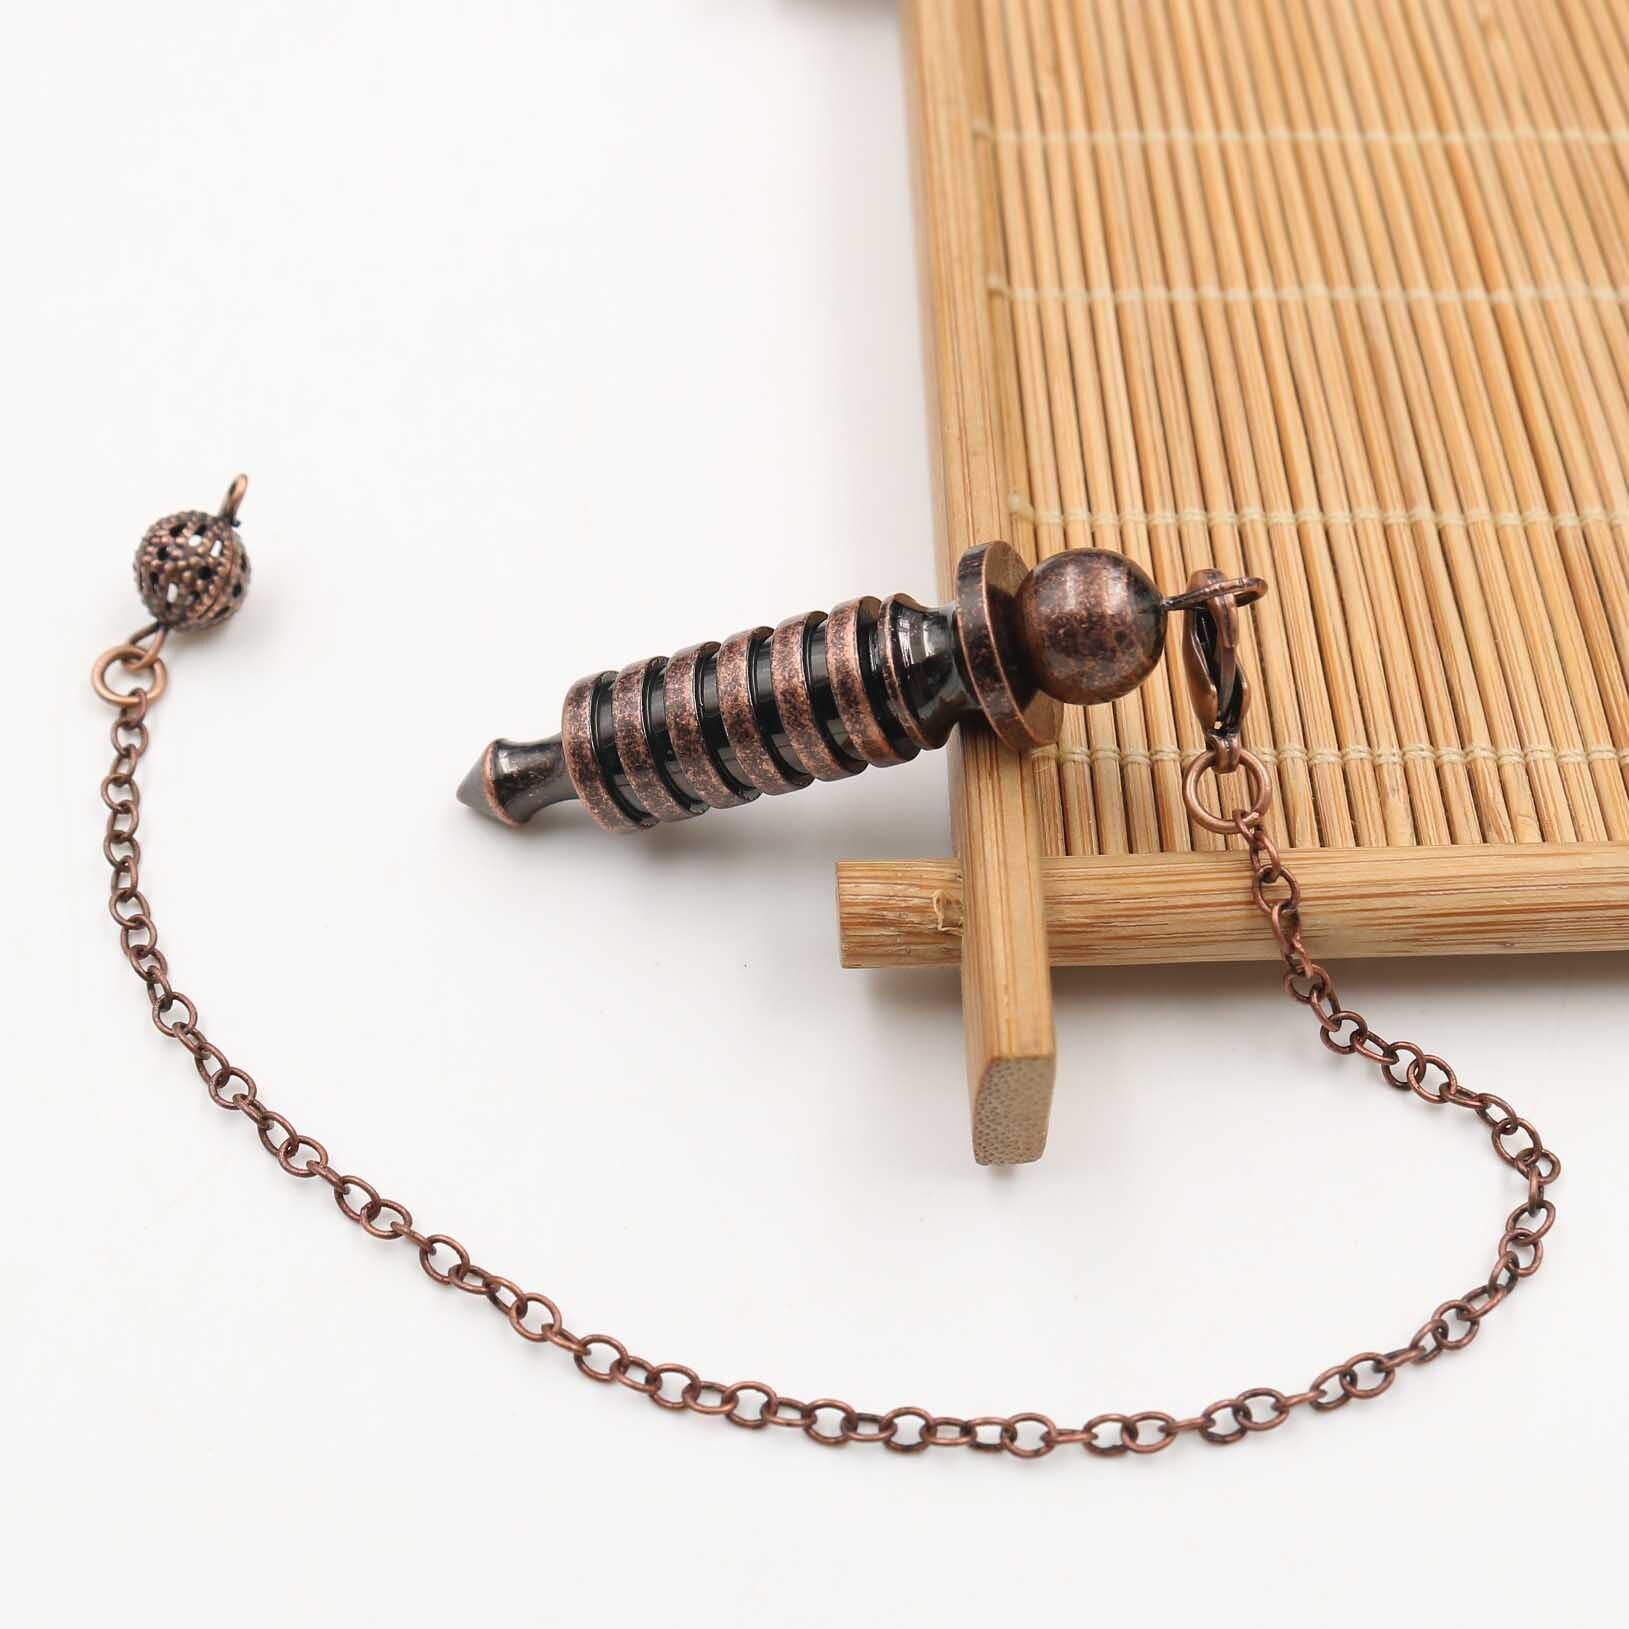 Metal Pendulums for Dowsing Divination Reiki Healing Spiritual Wicca Women Men Amulet Screw Shape Pendule Chains Charm Jewelry 8